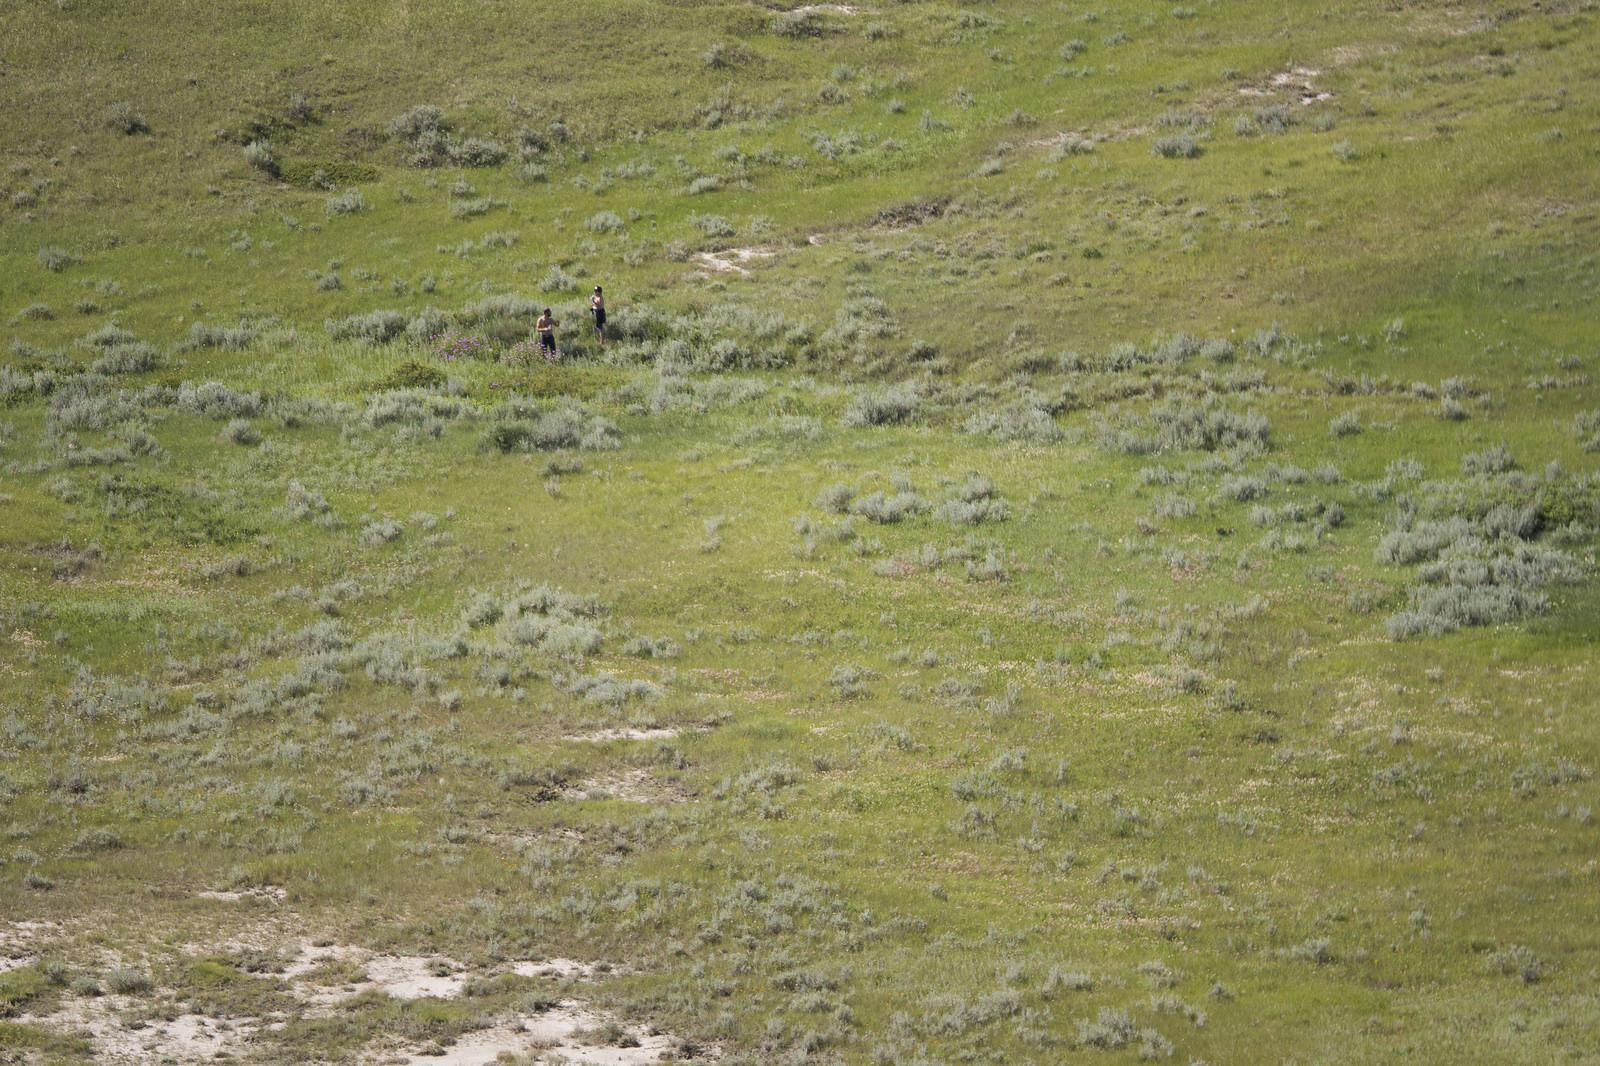 A couple wandering through the grass.